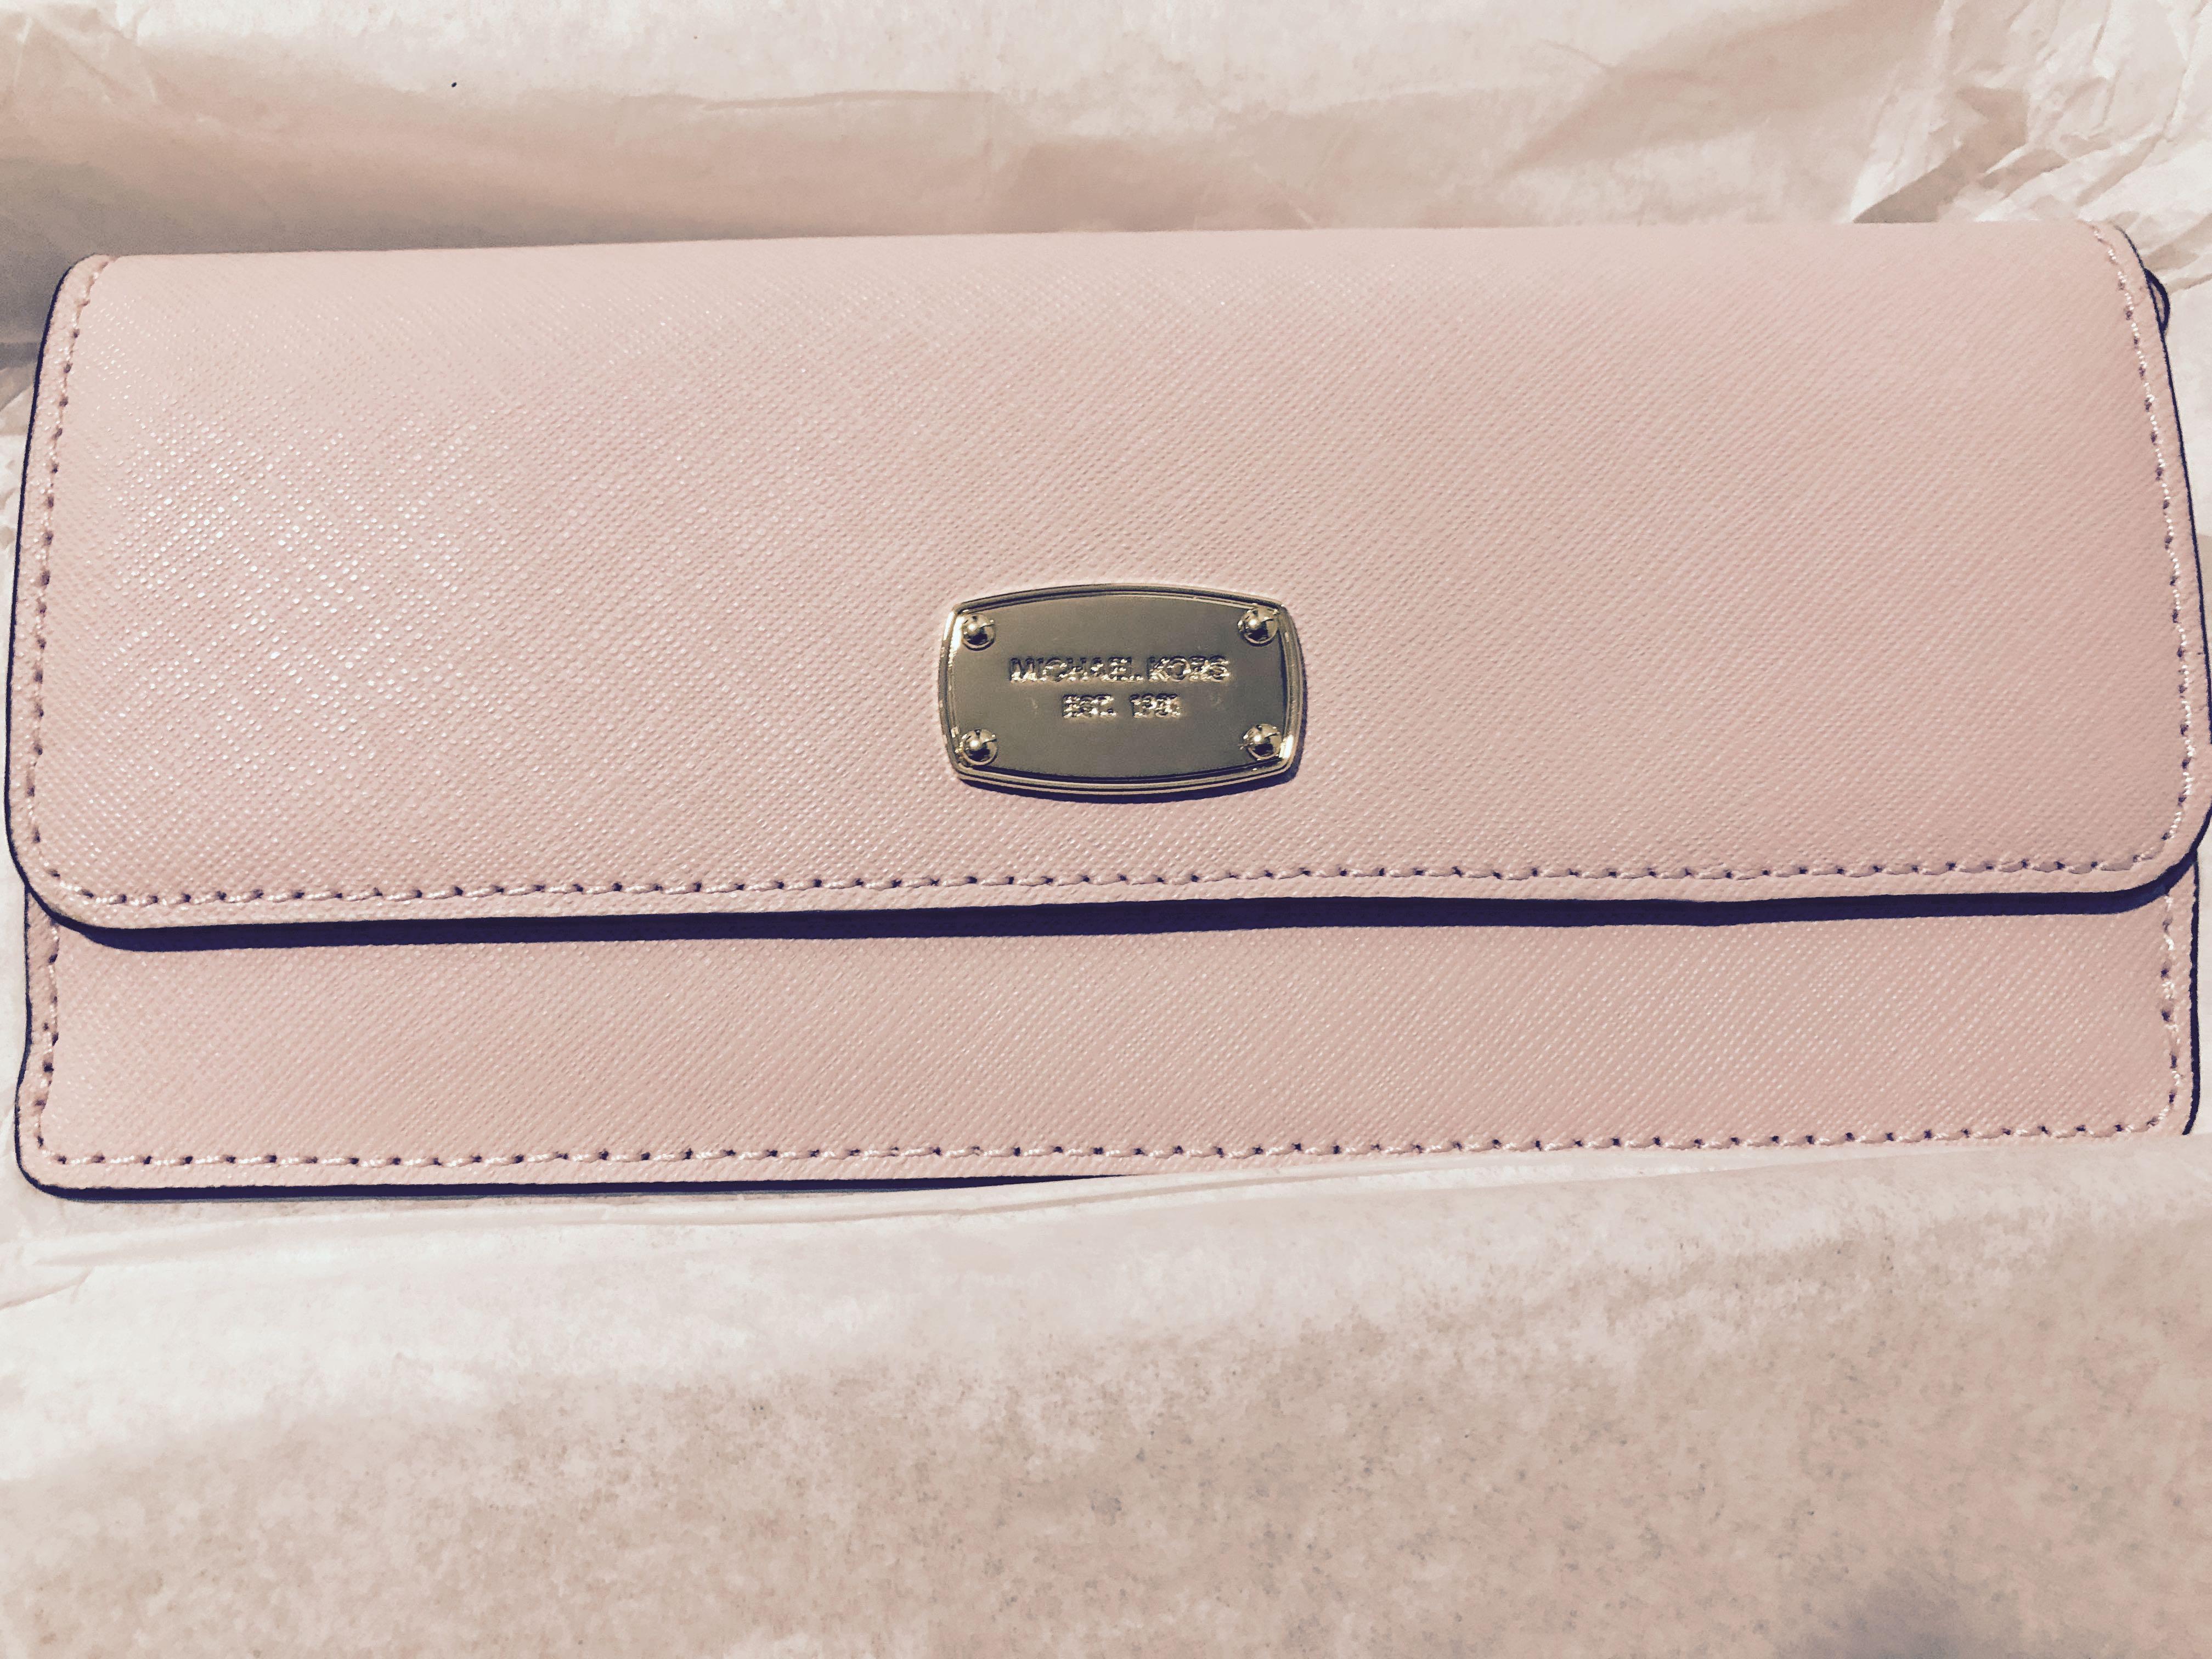 c585fa484028 Classy Champagne Pink MK wallet, Women's Fashion, Bags & Wallets ...